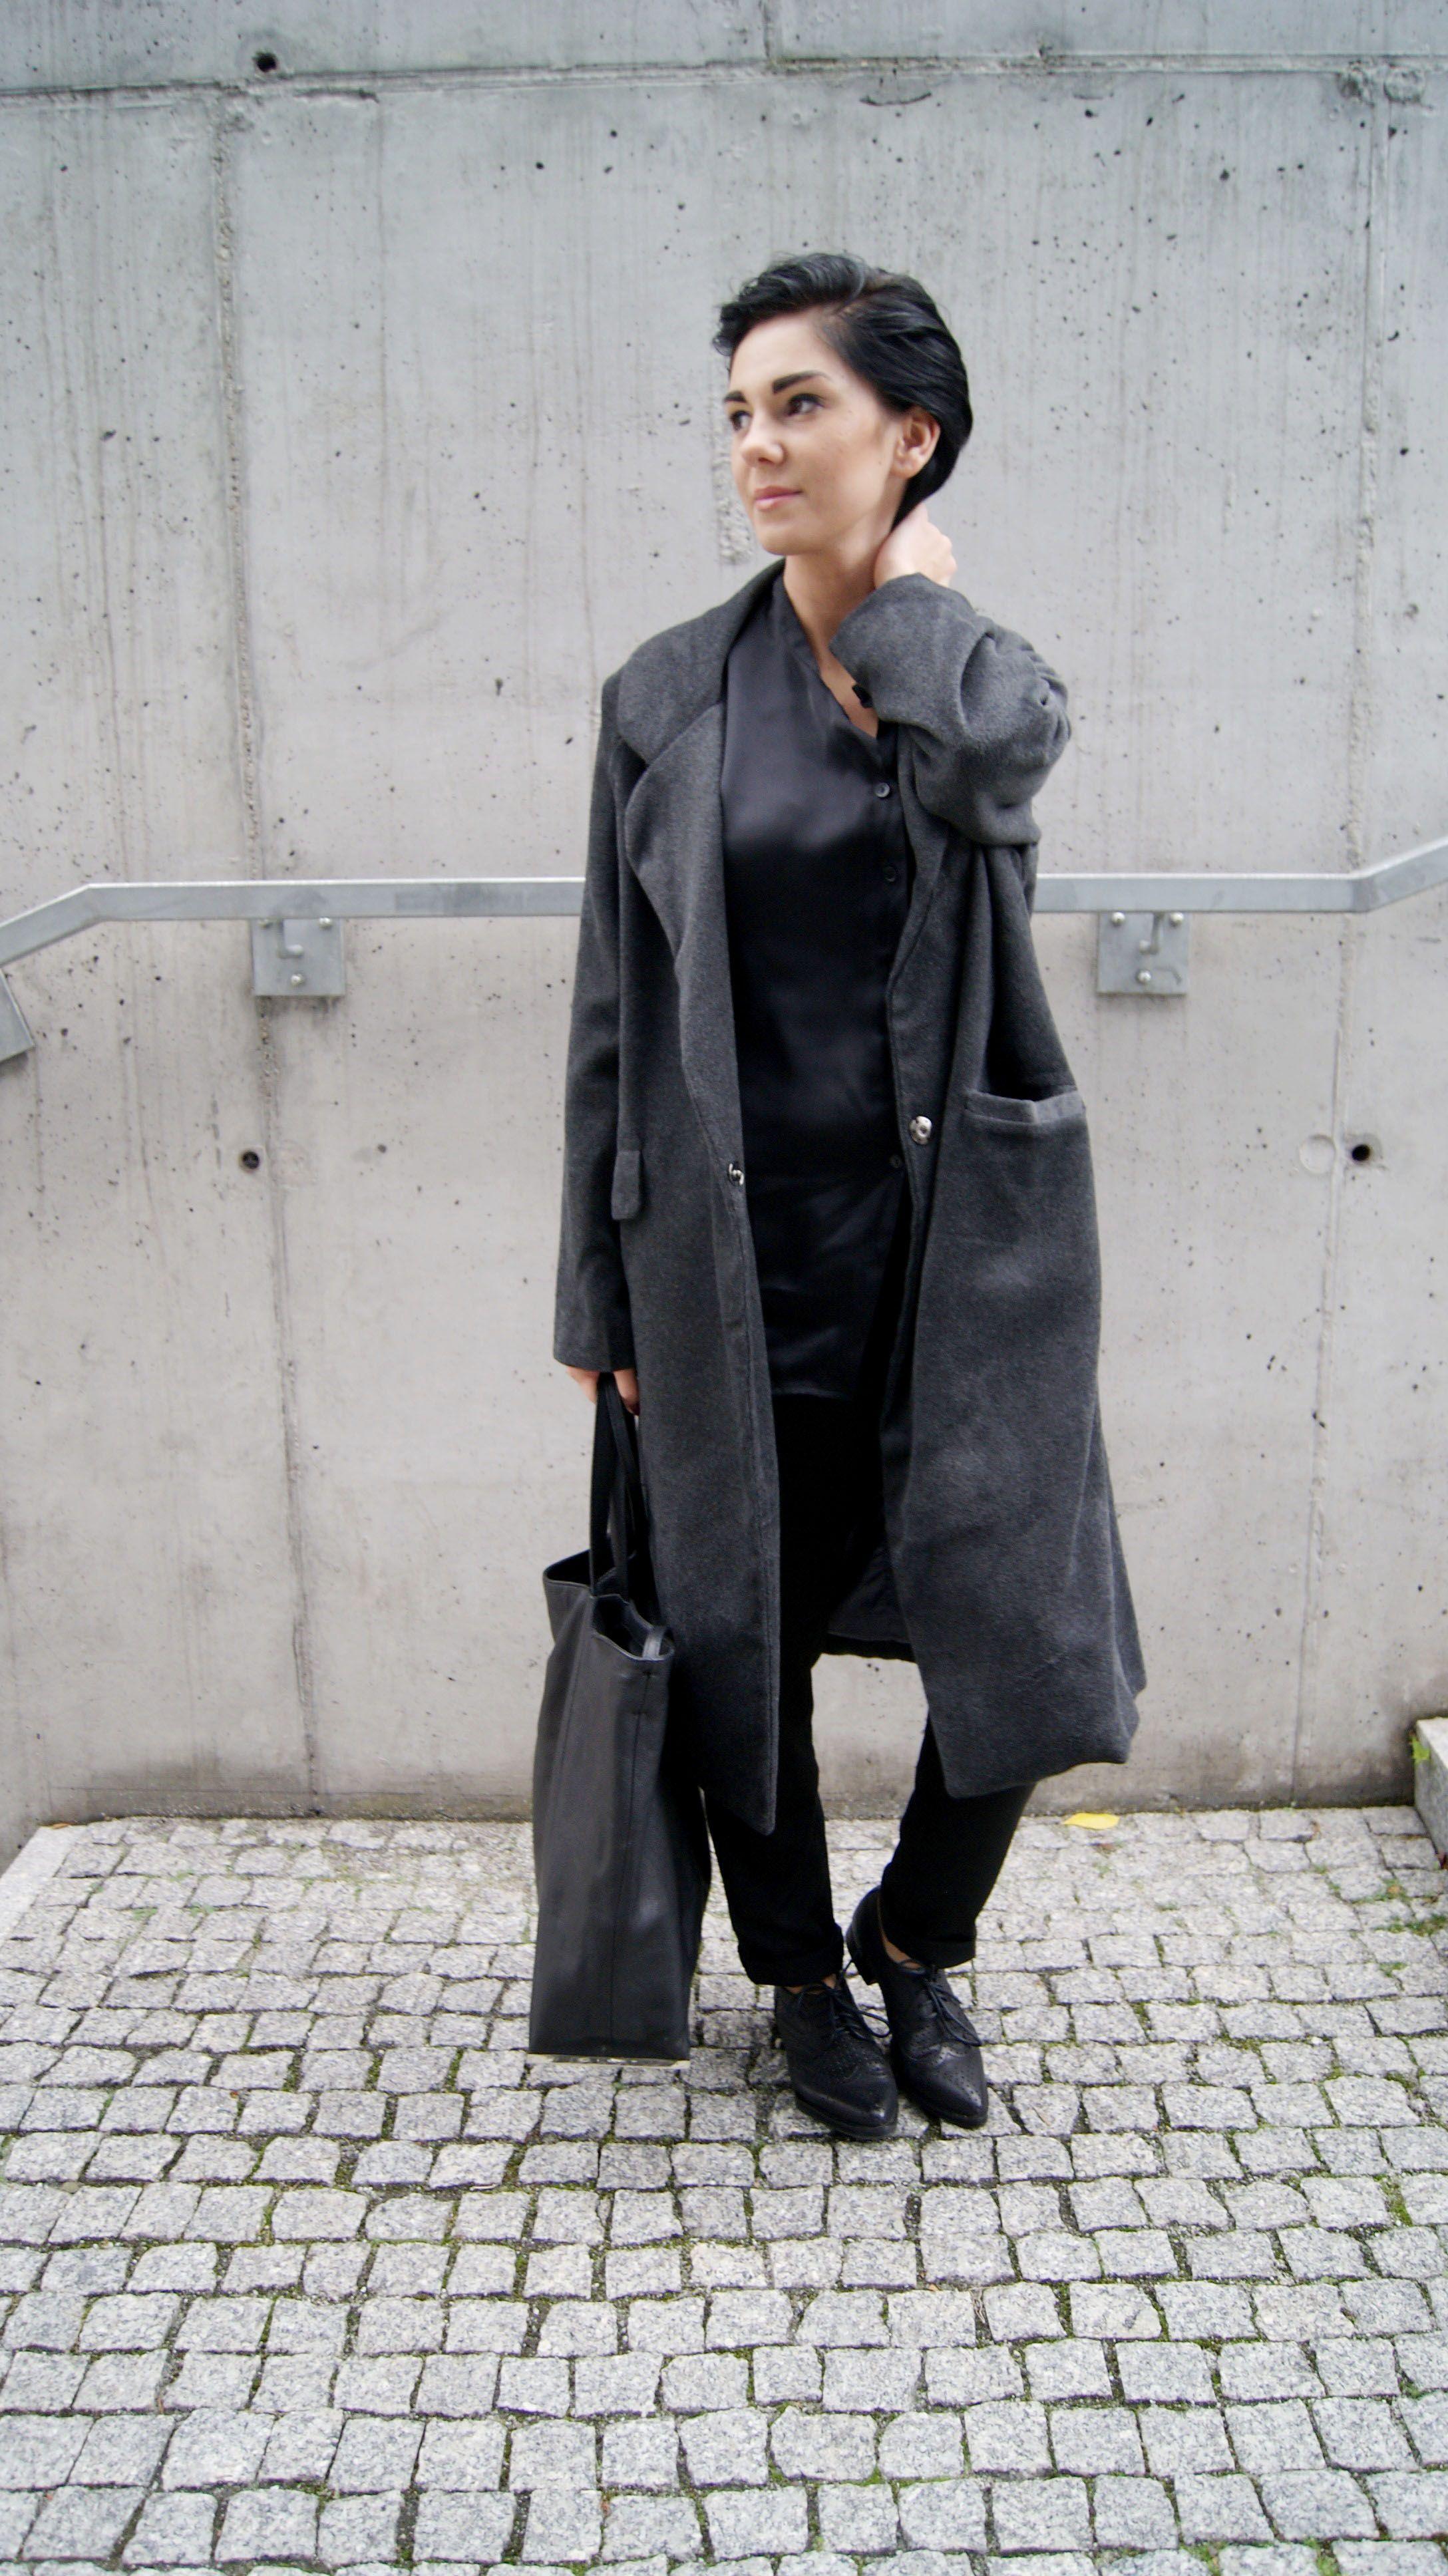 coat: http://www.choies.com/product/deep-gray-longline-wool-coat_p17528?cid=2759jesspai  shoes: http://www.choies.com/product/vintage-cut-out-lace-up-brogue-shoes-in-black_p28984?cid=2759jesspai  visit me to see more:) http://mesmerize87.blogspot.com/2014/10/satin-black.html